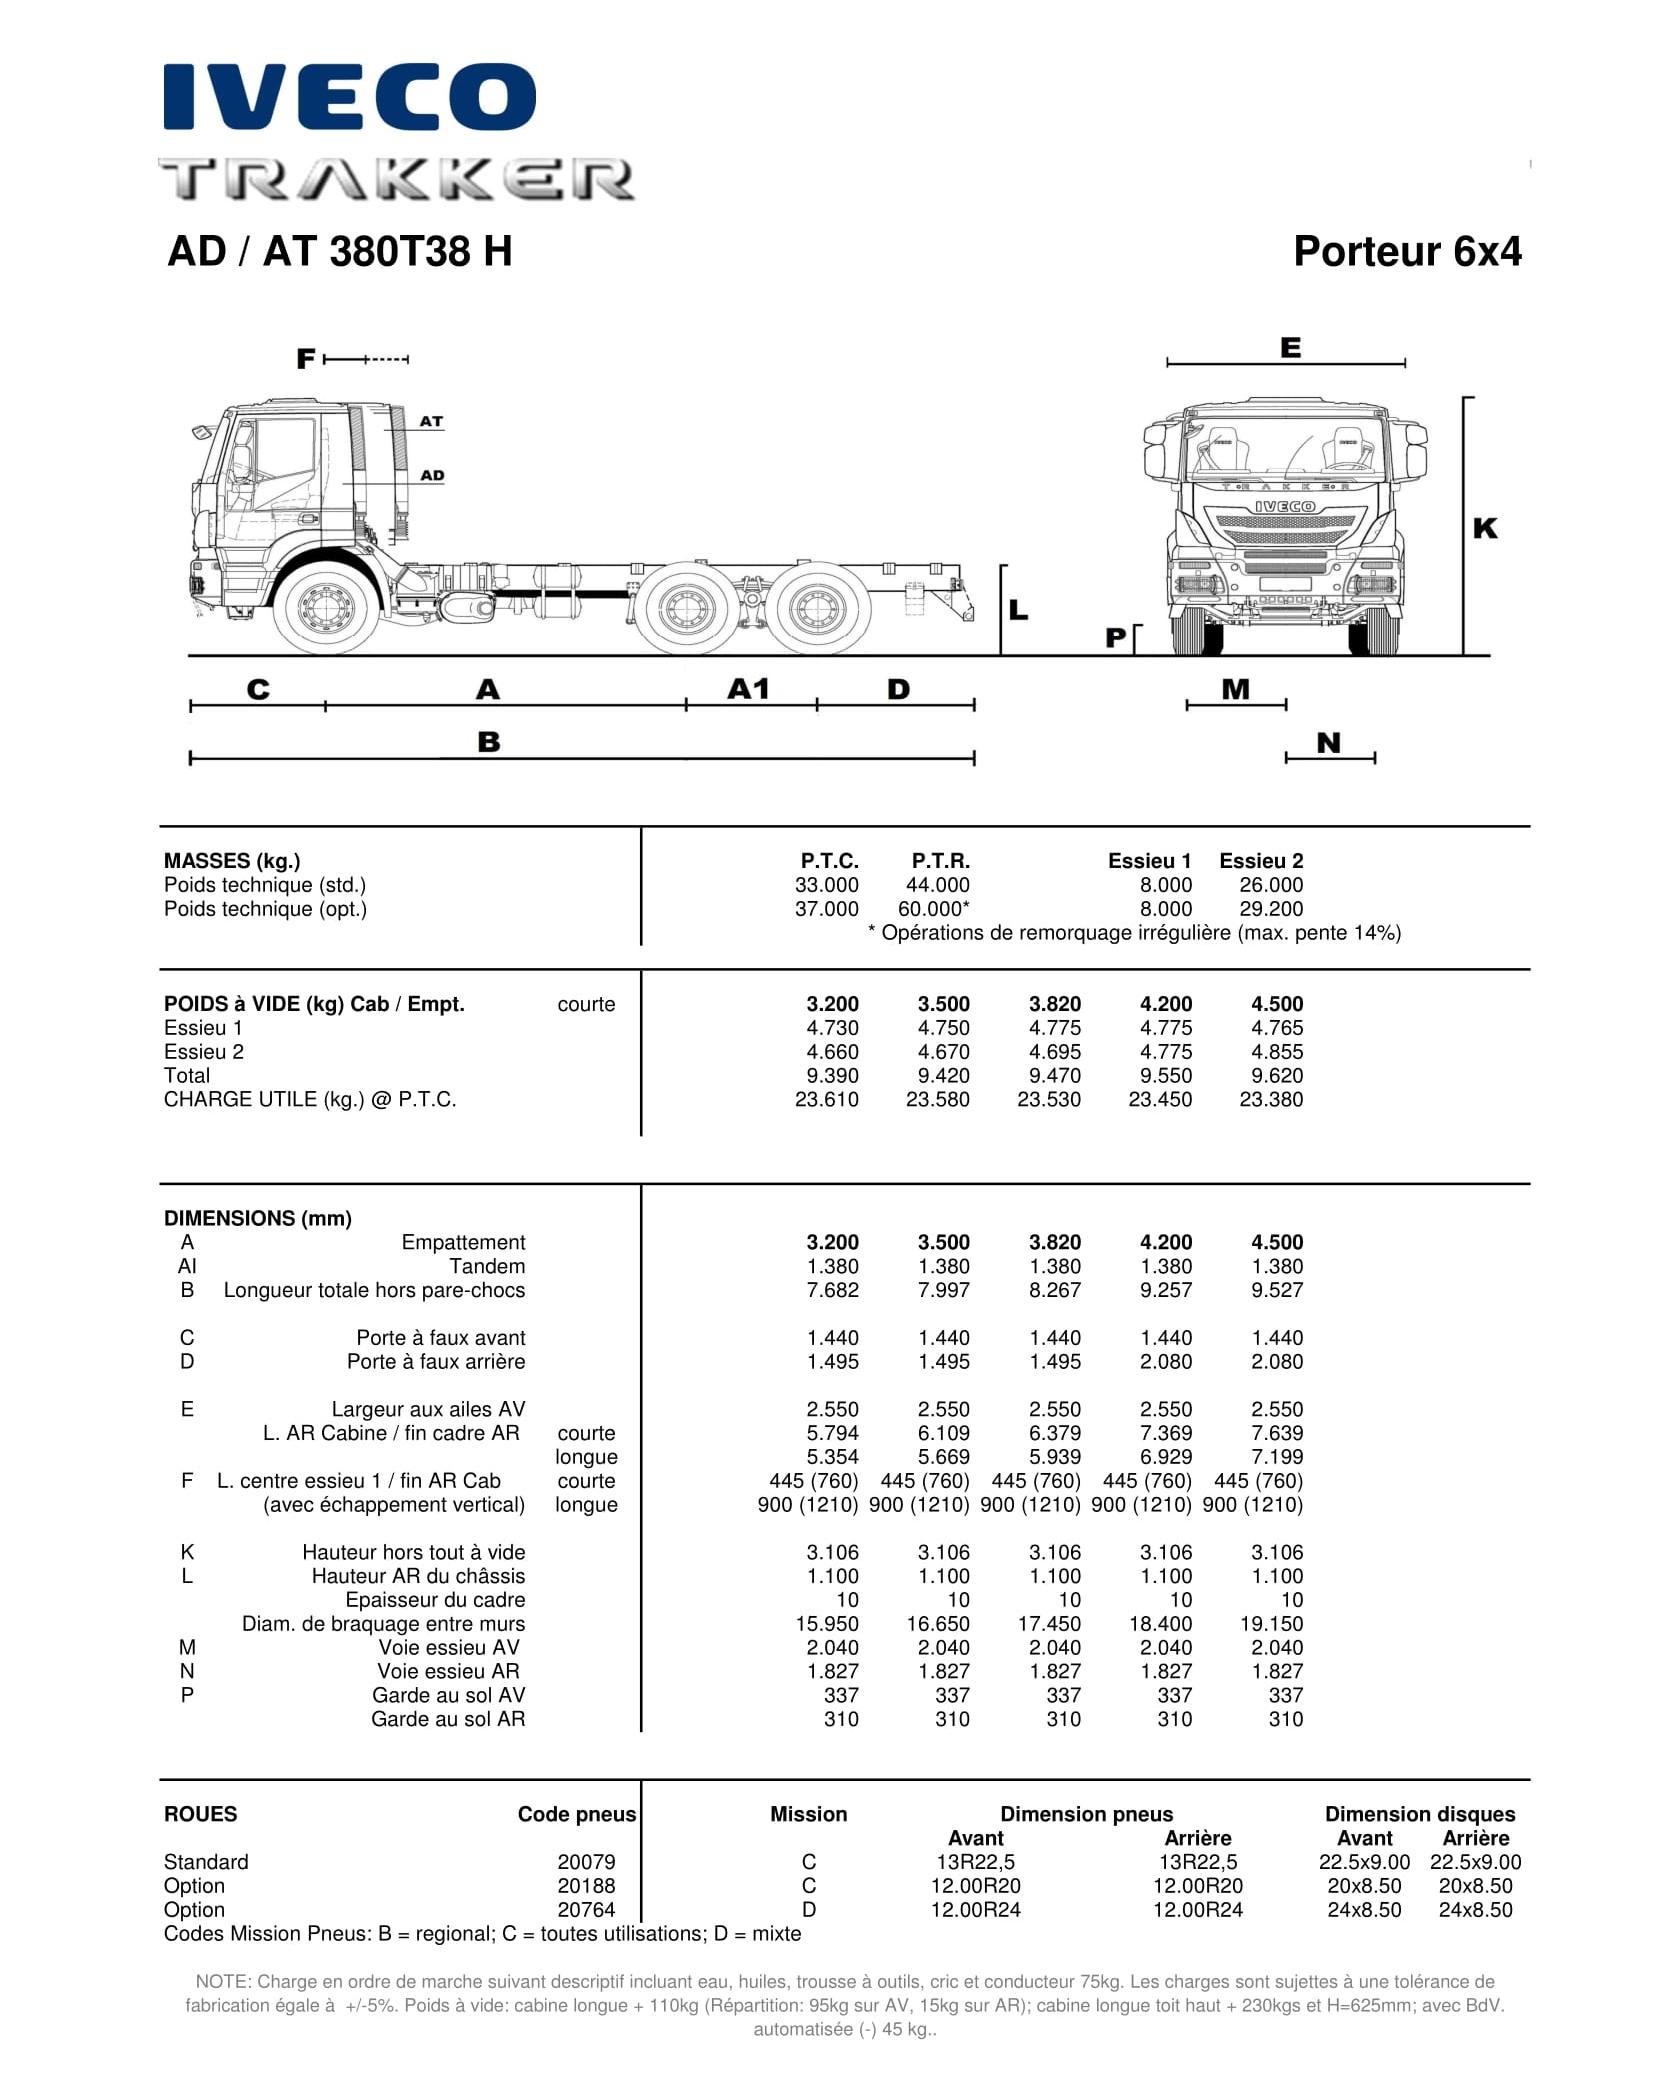 11 AD 380T38 H - FR-11111